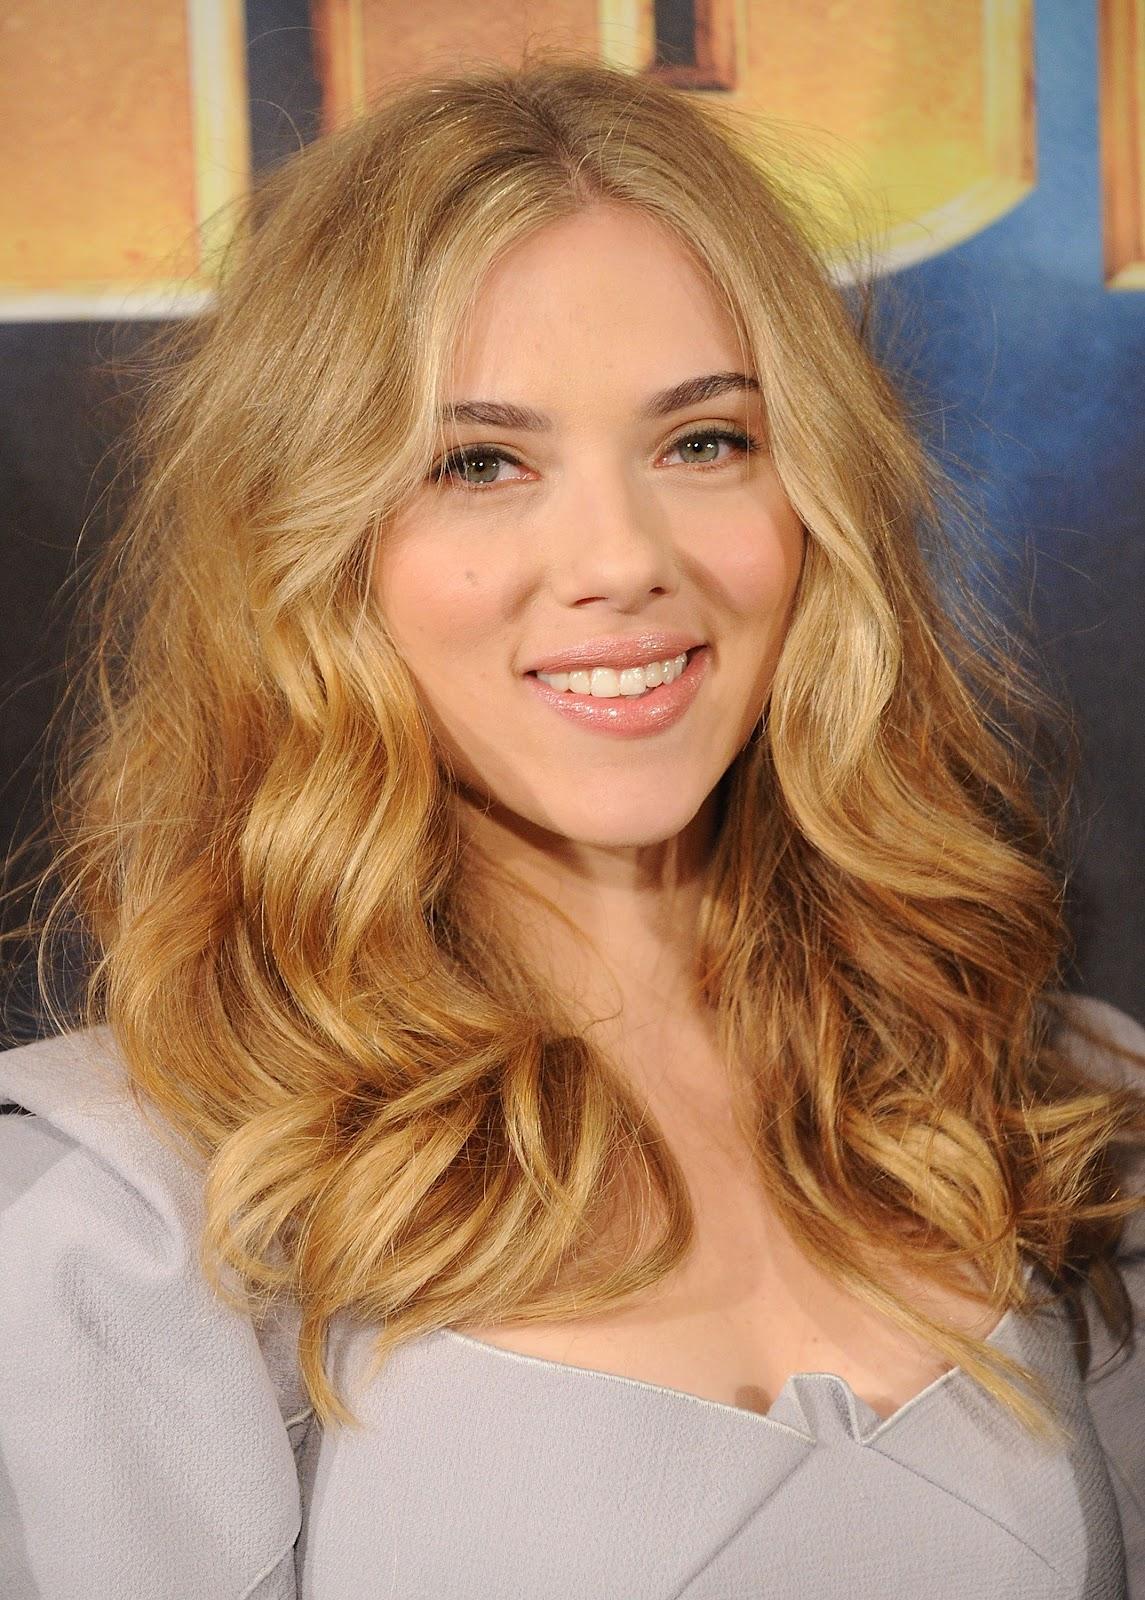 49. Scarlett Johansson